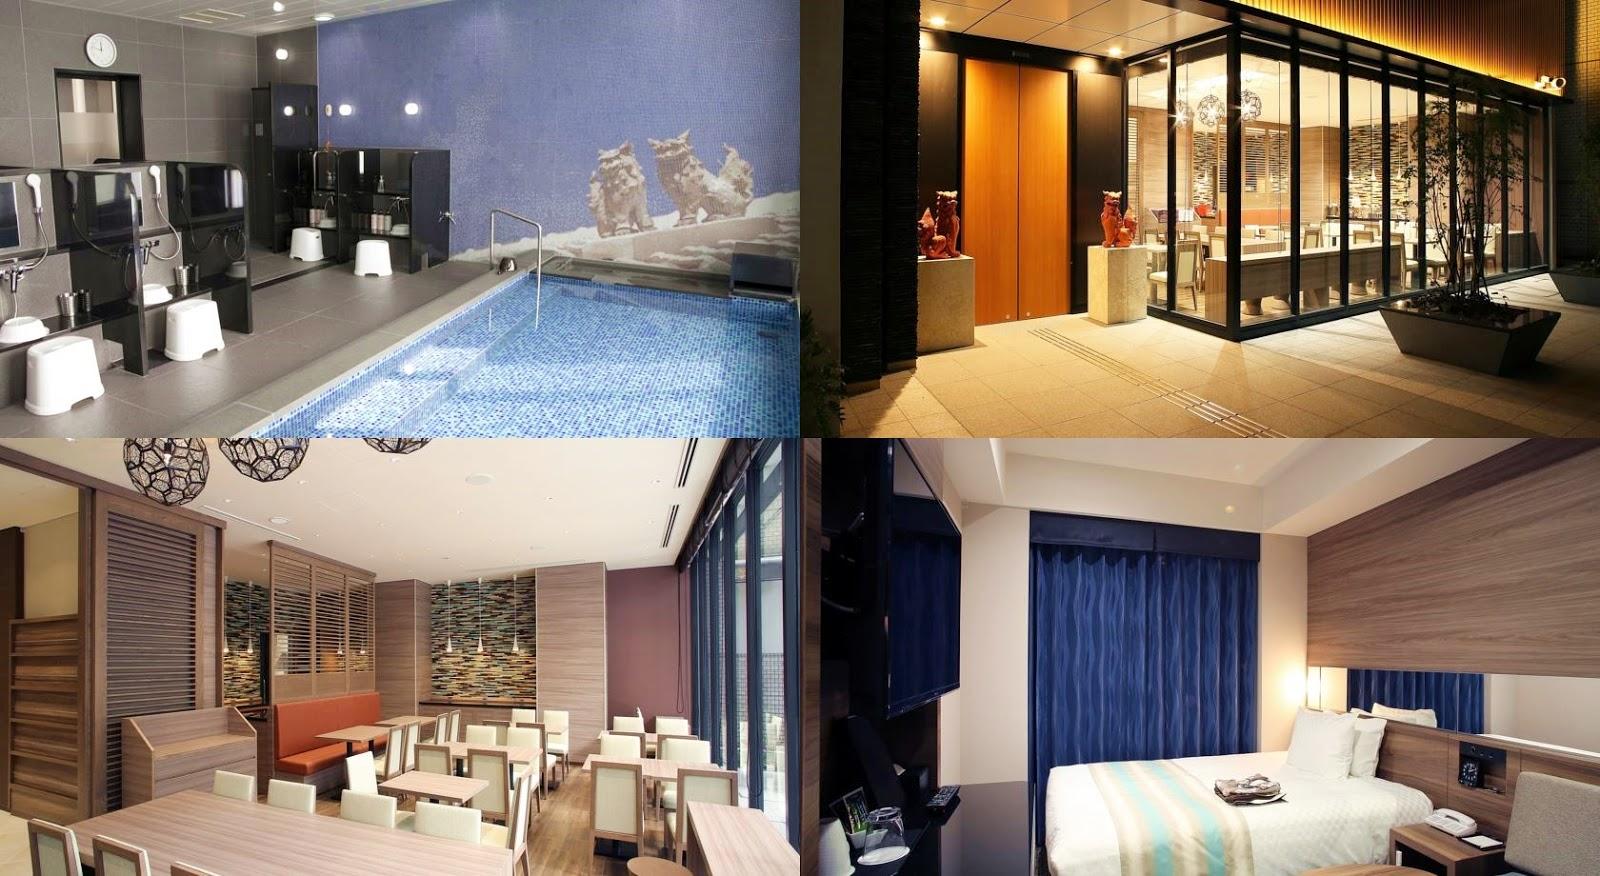 沖繩-住宿-推薦-那霸-縣廳前阿爾蒙特酒店Almont-Hotel-Naha-Kenchomae-Okinawa-hotel-recommendation